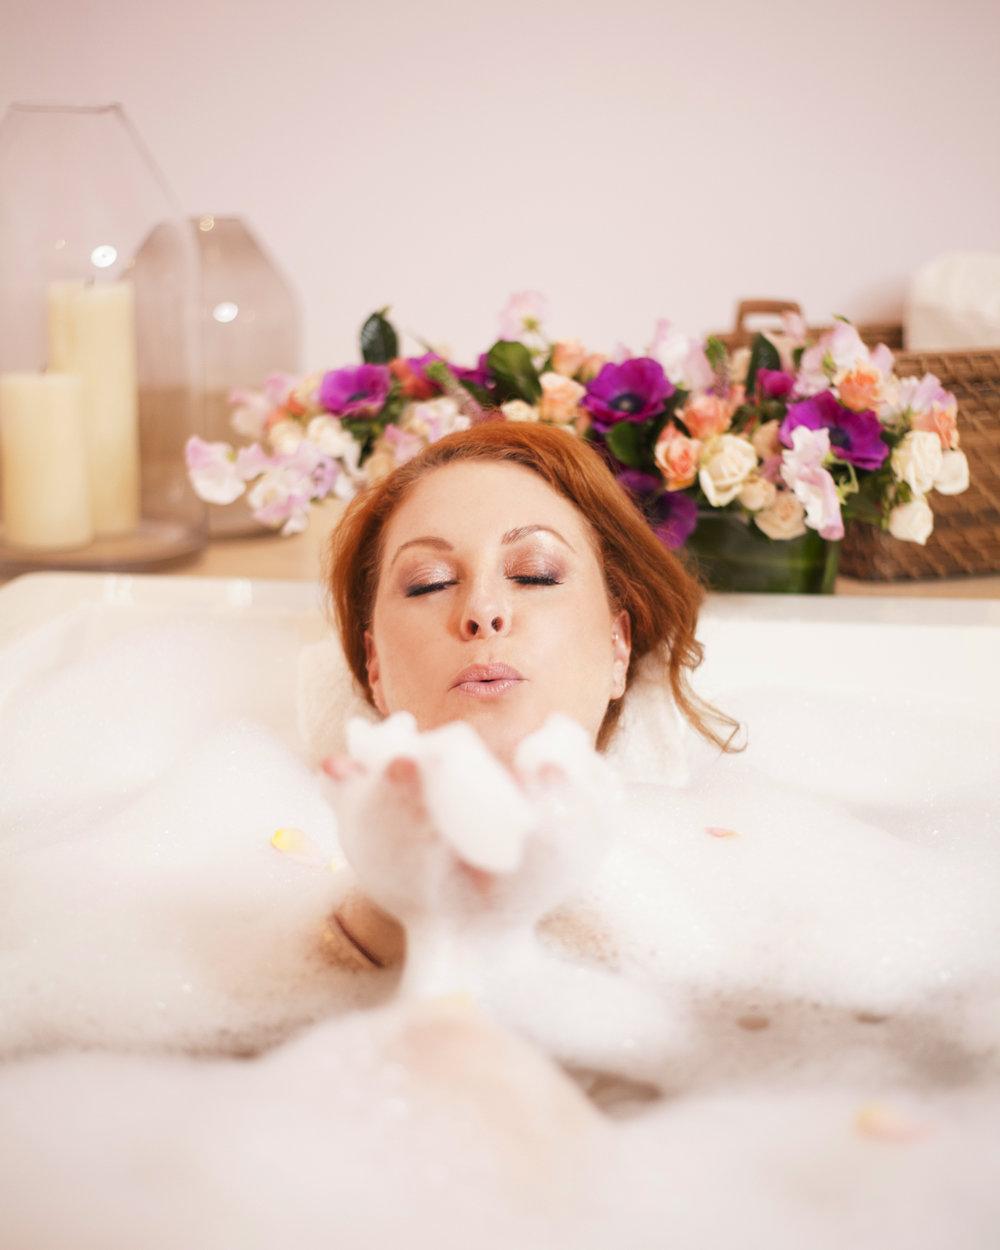 joanna-vargas-skincare-nyc-los-angeles-sunset-tower-hotel-super-nova-serum-oscars-week-2018-west-hollywood-celebrity-skincare-katrina-eugenia-photography64.jpg